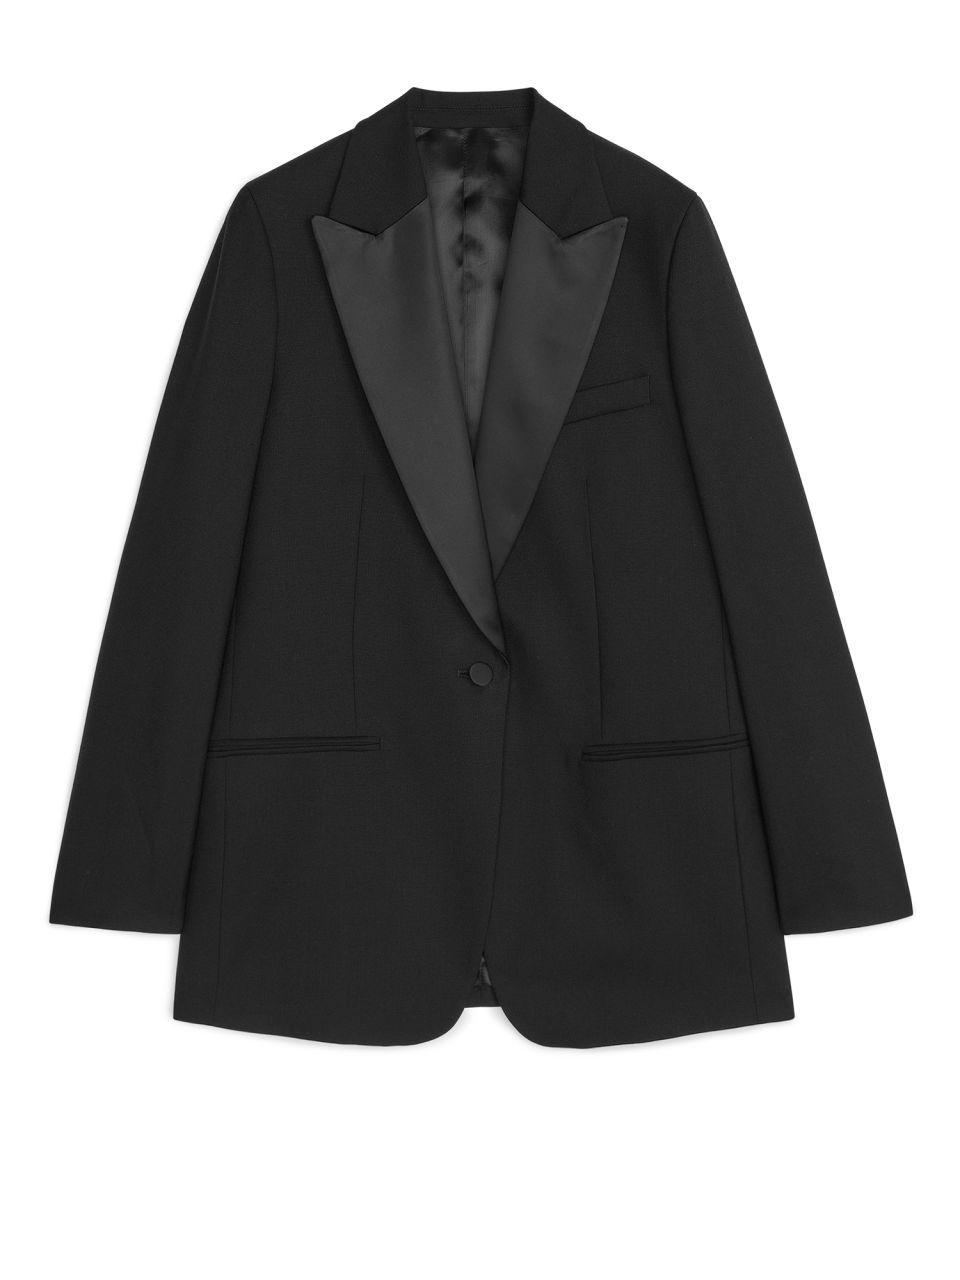 36684c84d9 Wool Hopsack Tuxedo Blazer - Black - Tailoring - ARKET GB in 2019 ...